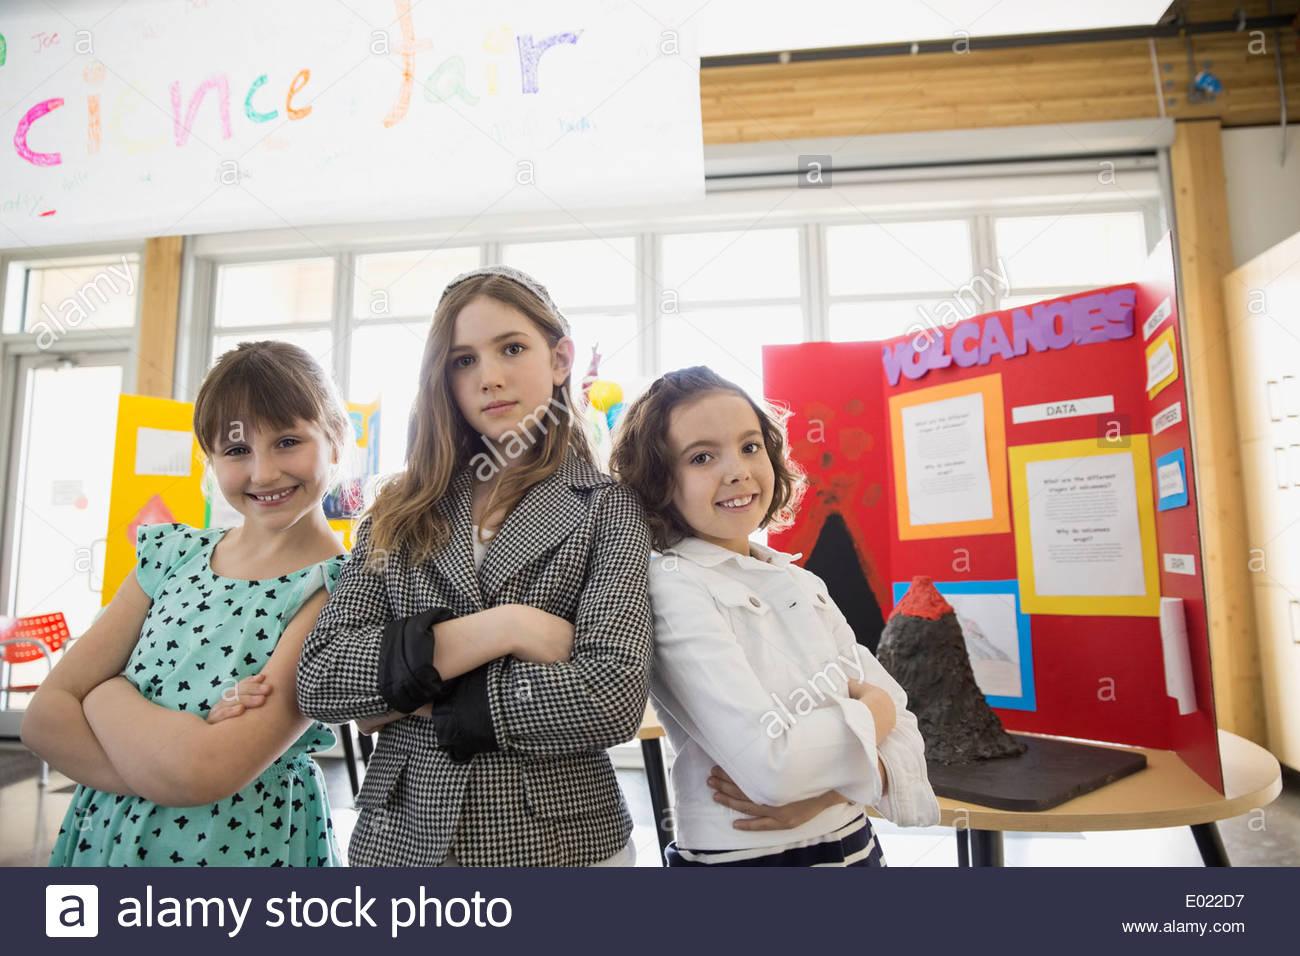 Portrait of confident school girls at science fair Stock Photo